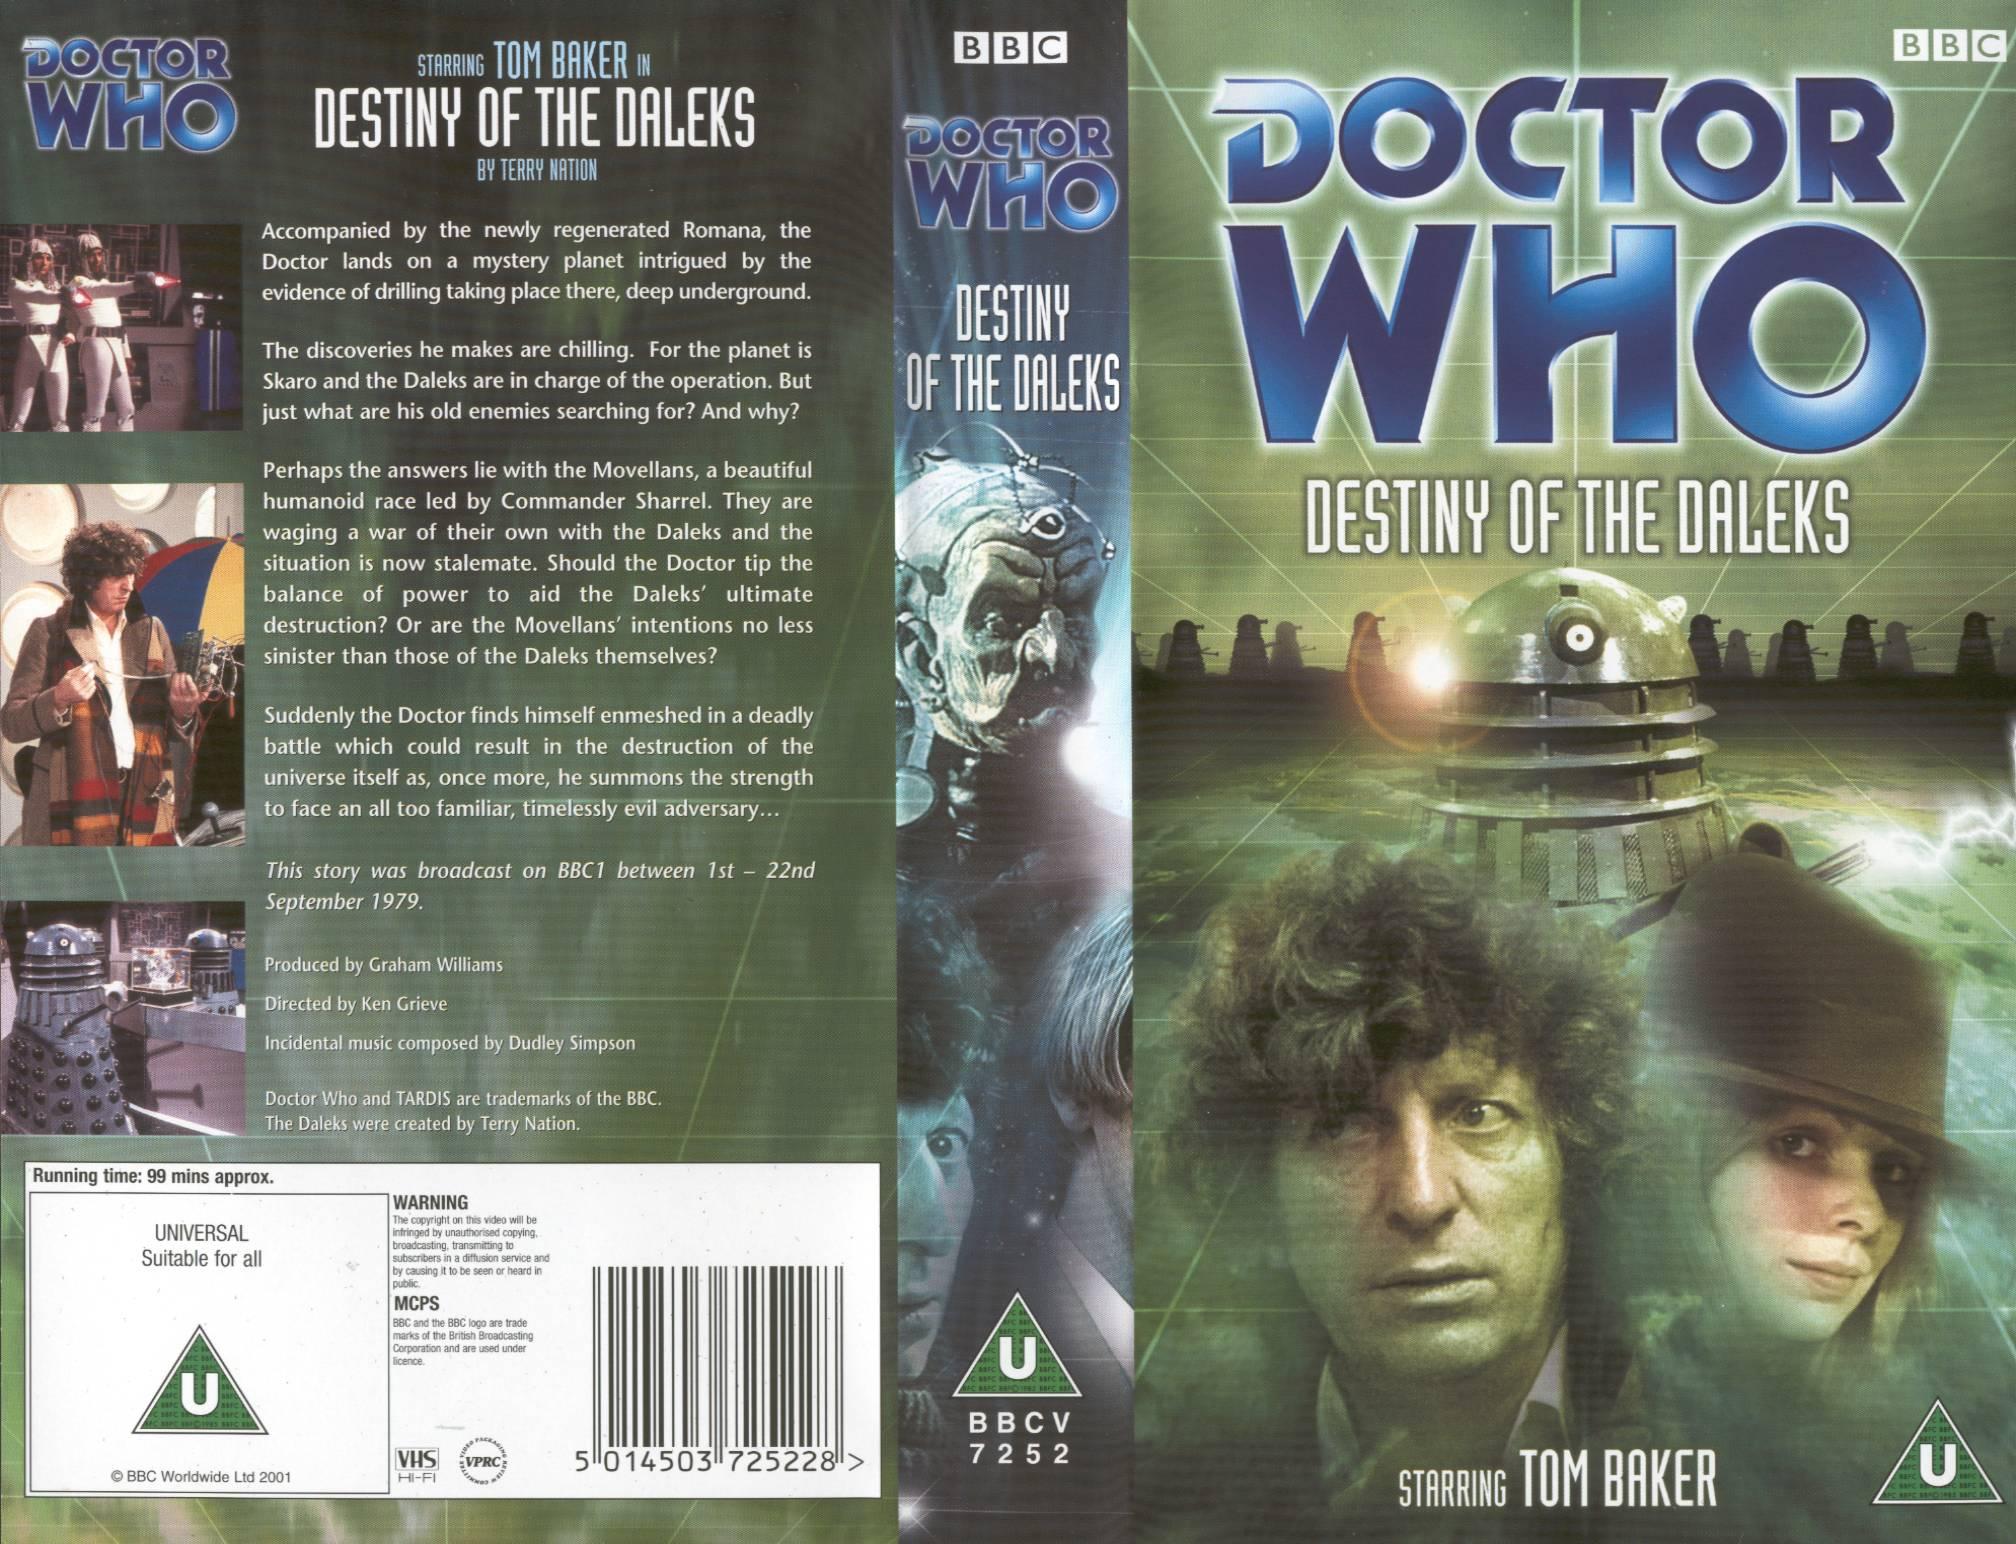 Destiny of the Daleks